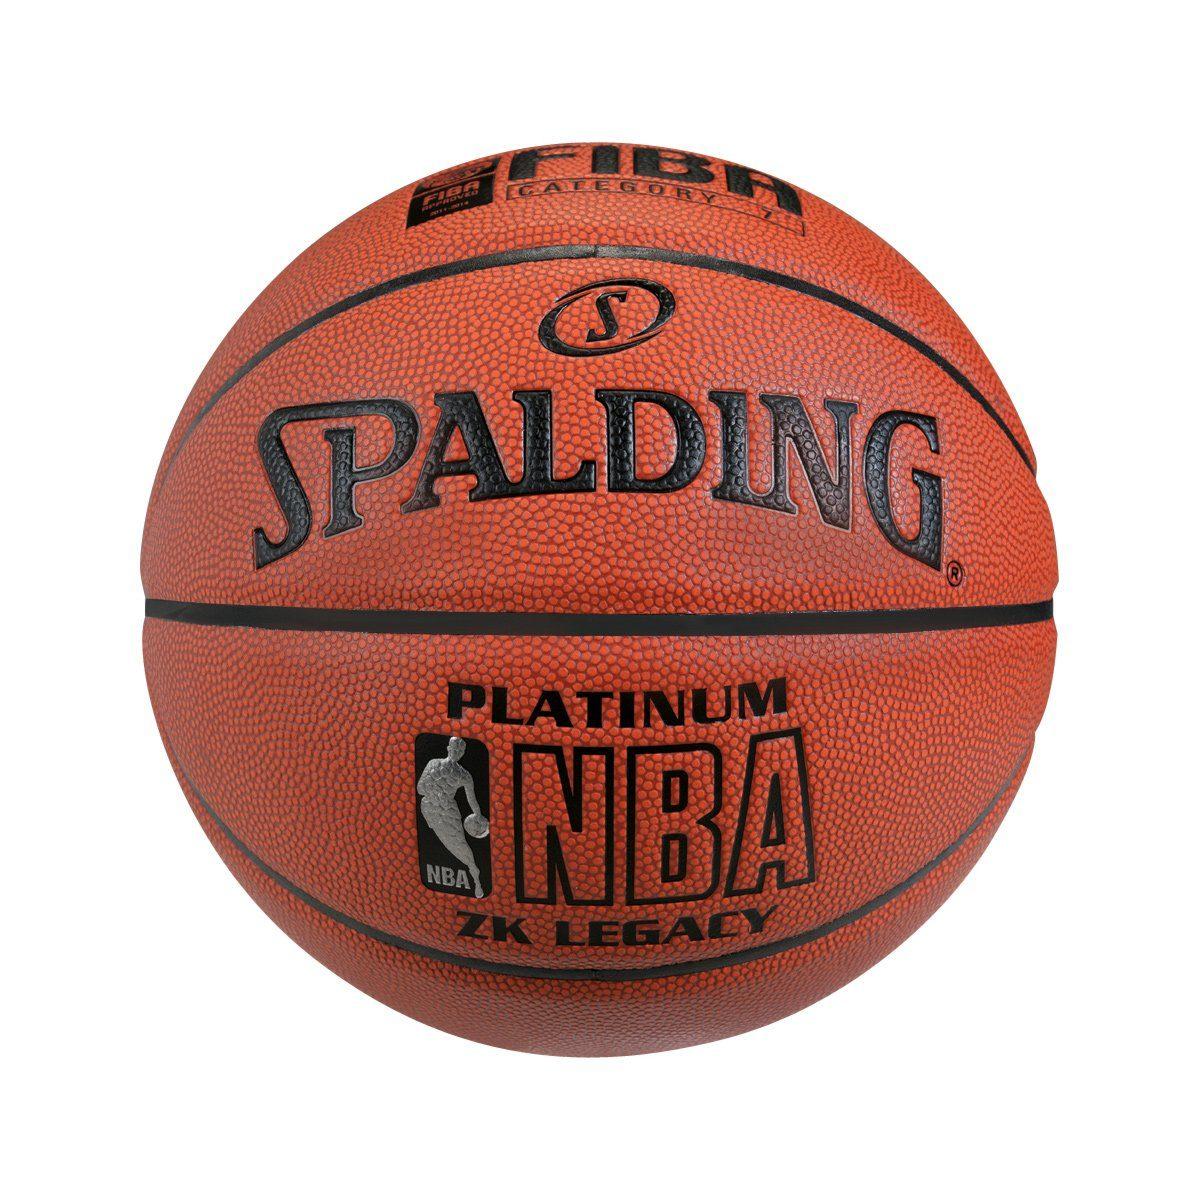 SPALDING NBA Platinum Legacy mit FIBA (74-468Z) Basketball